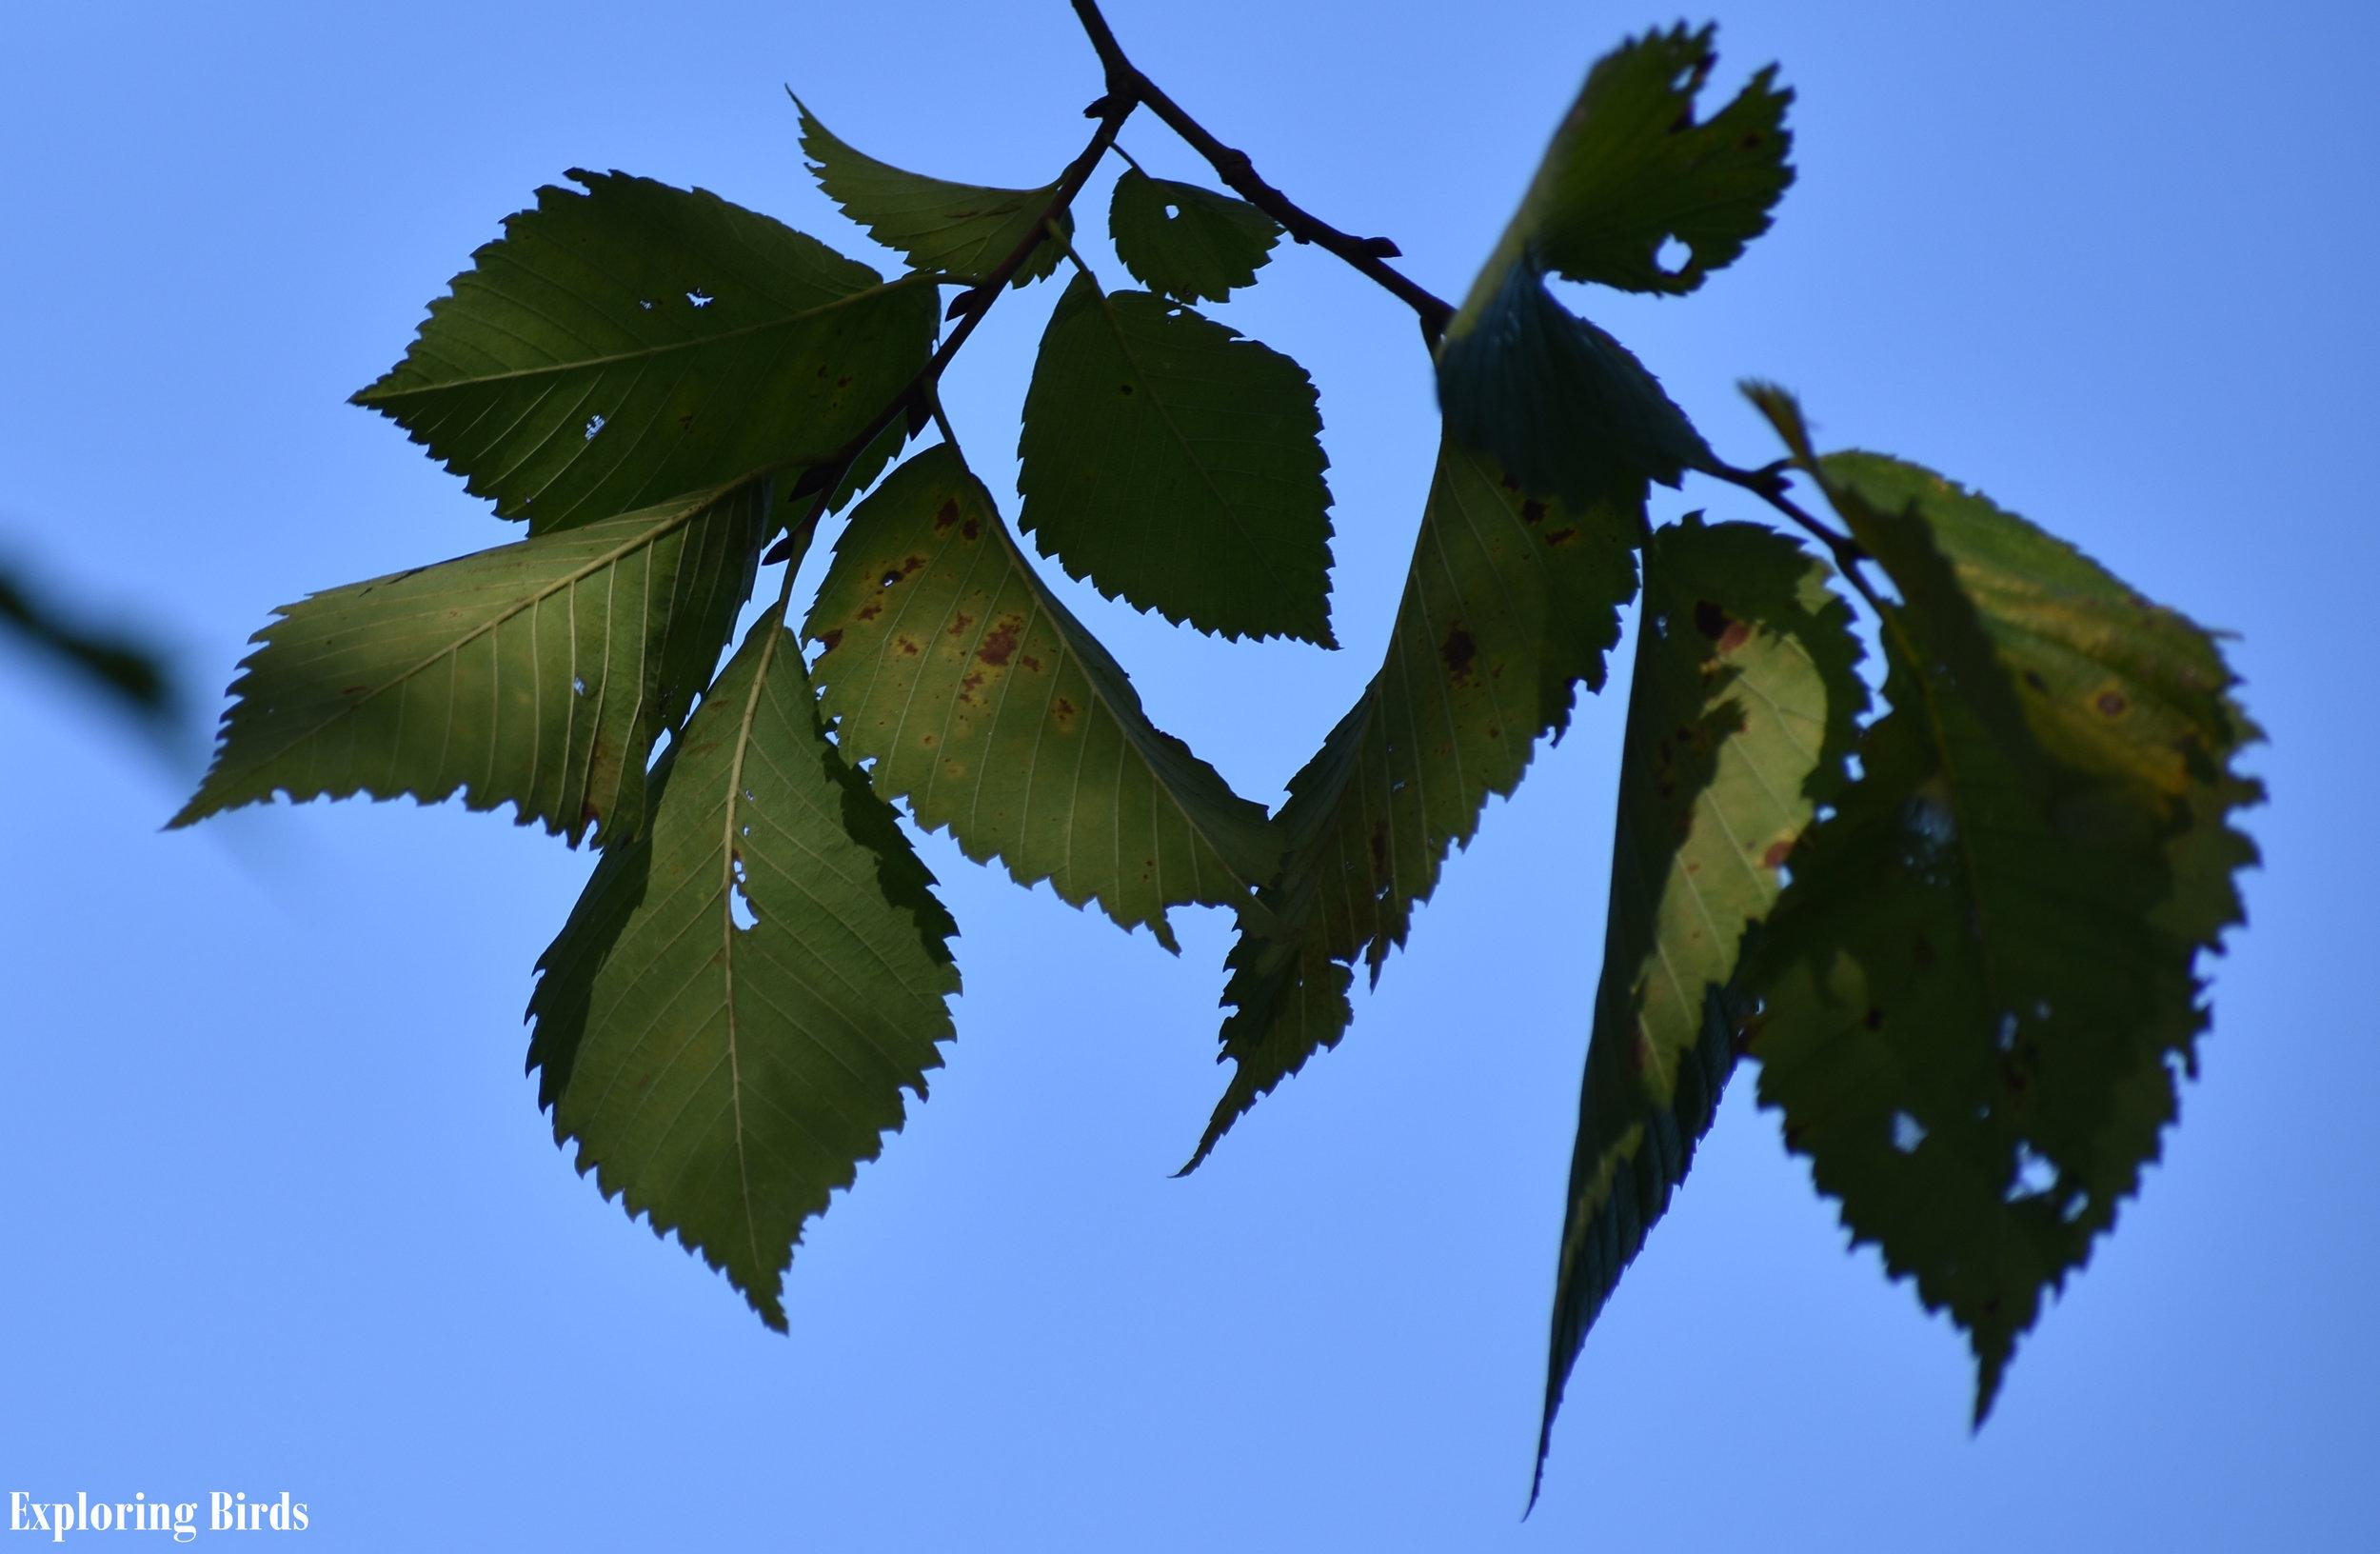 Elm trees attract birds